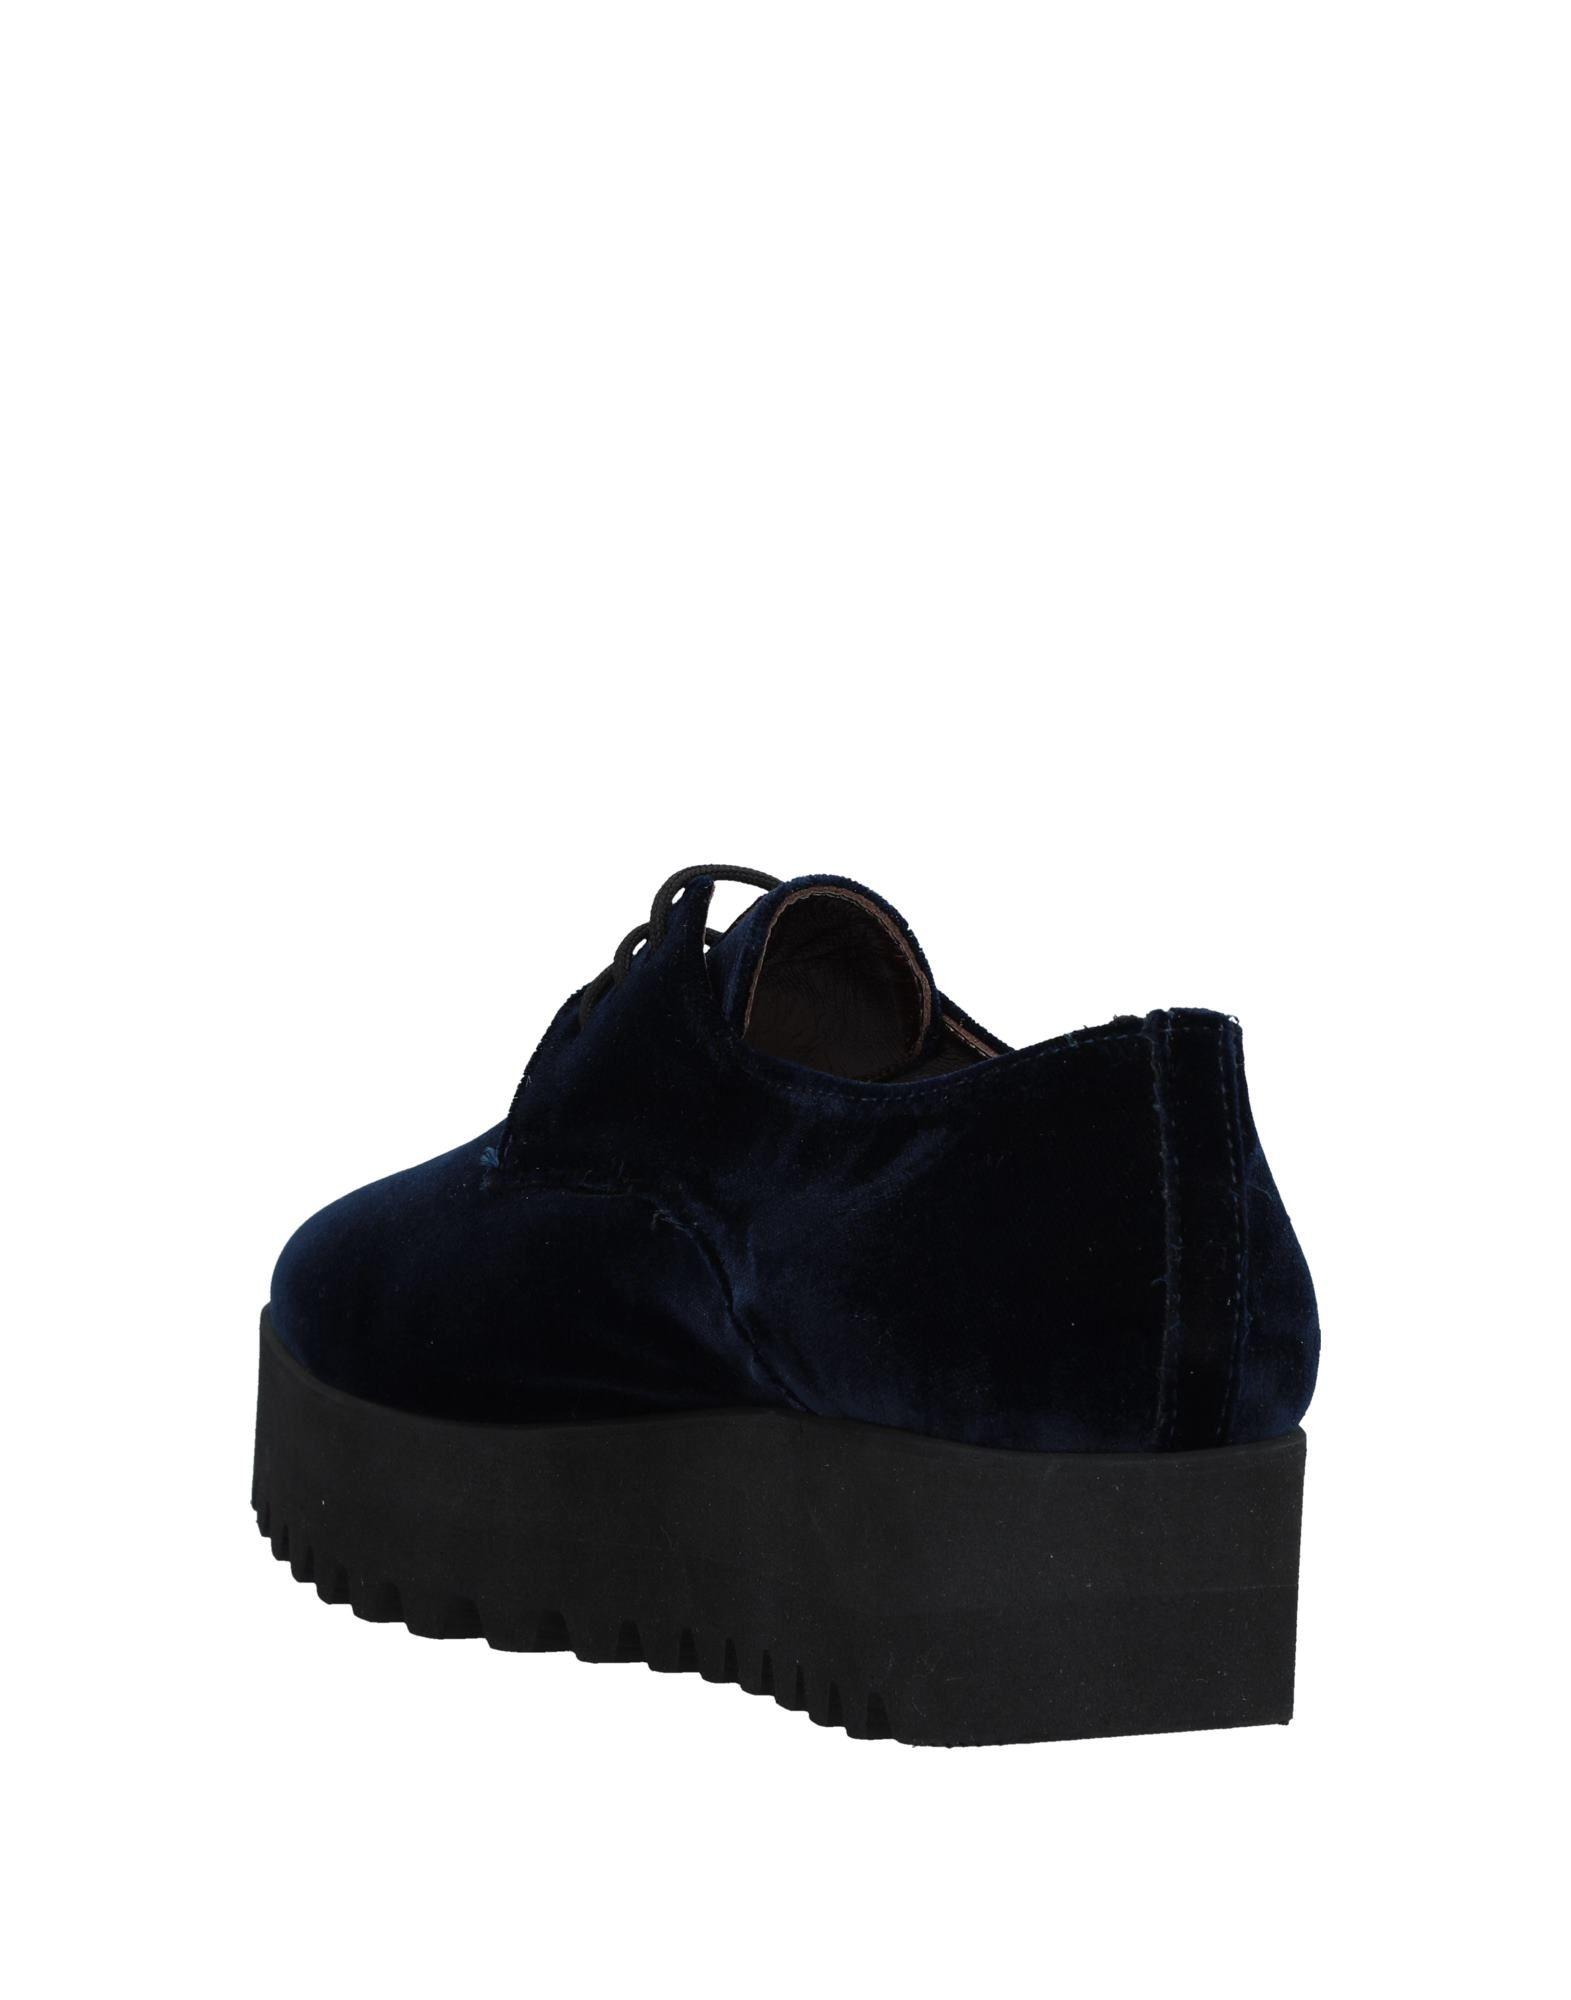 Stilvolle billige Schuhe Damen Alexander Smith Schnürschuhe Damen Schuhe  11539668KB 700a02